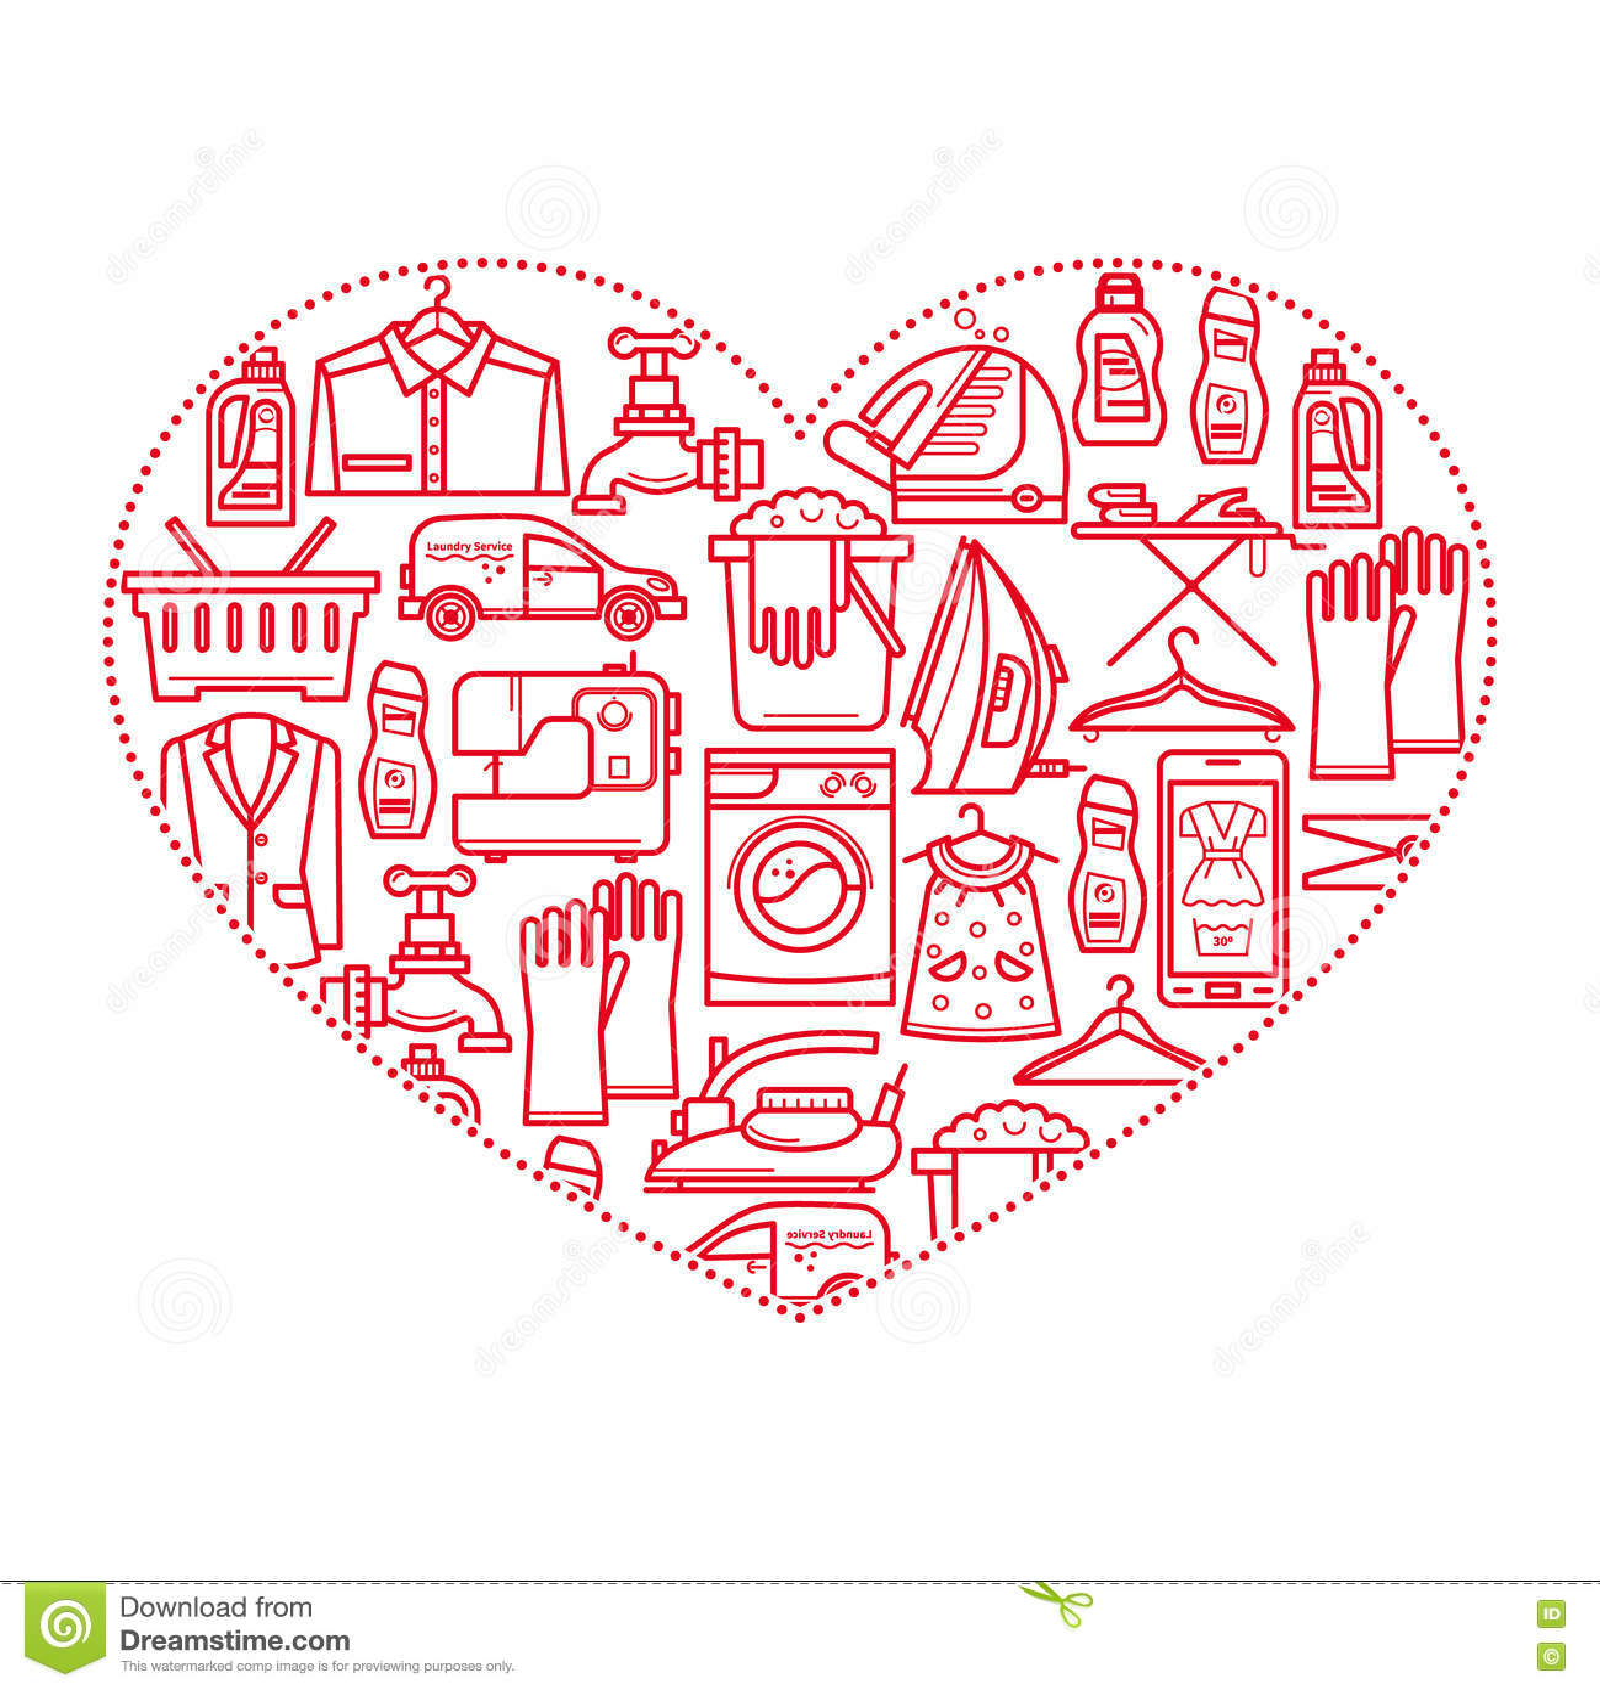 Washing machine symbols best machine 2017 washing machine symbols biocorpaavc Choice Image